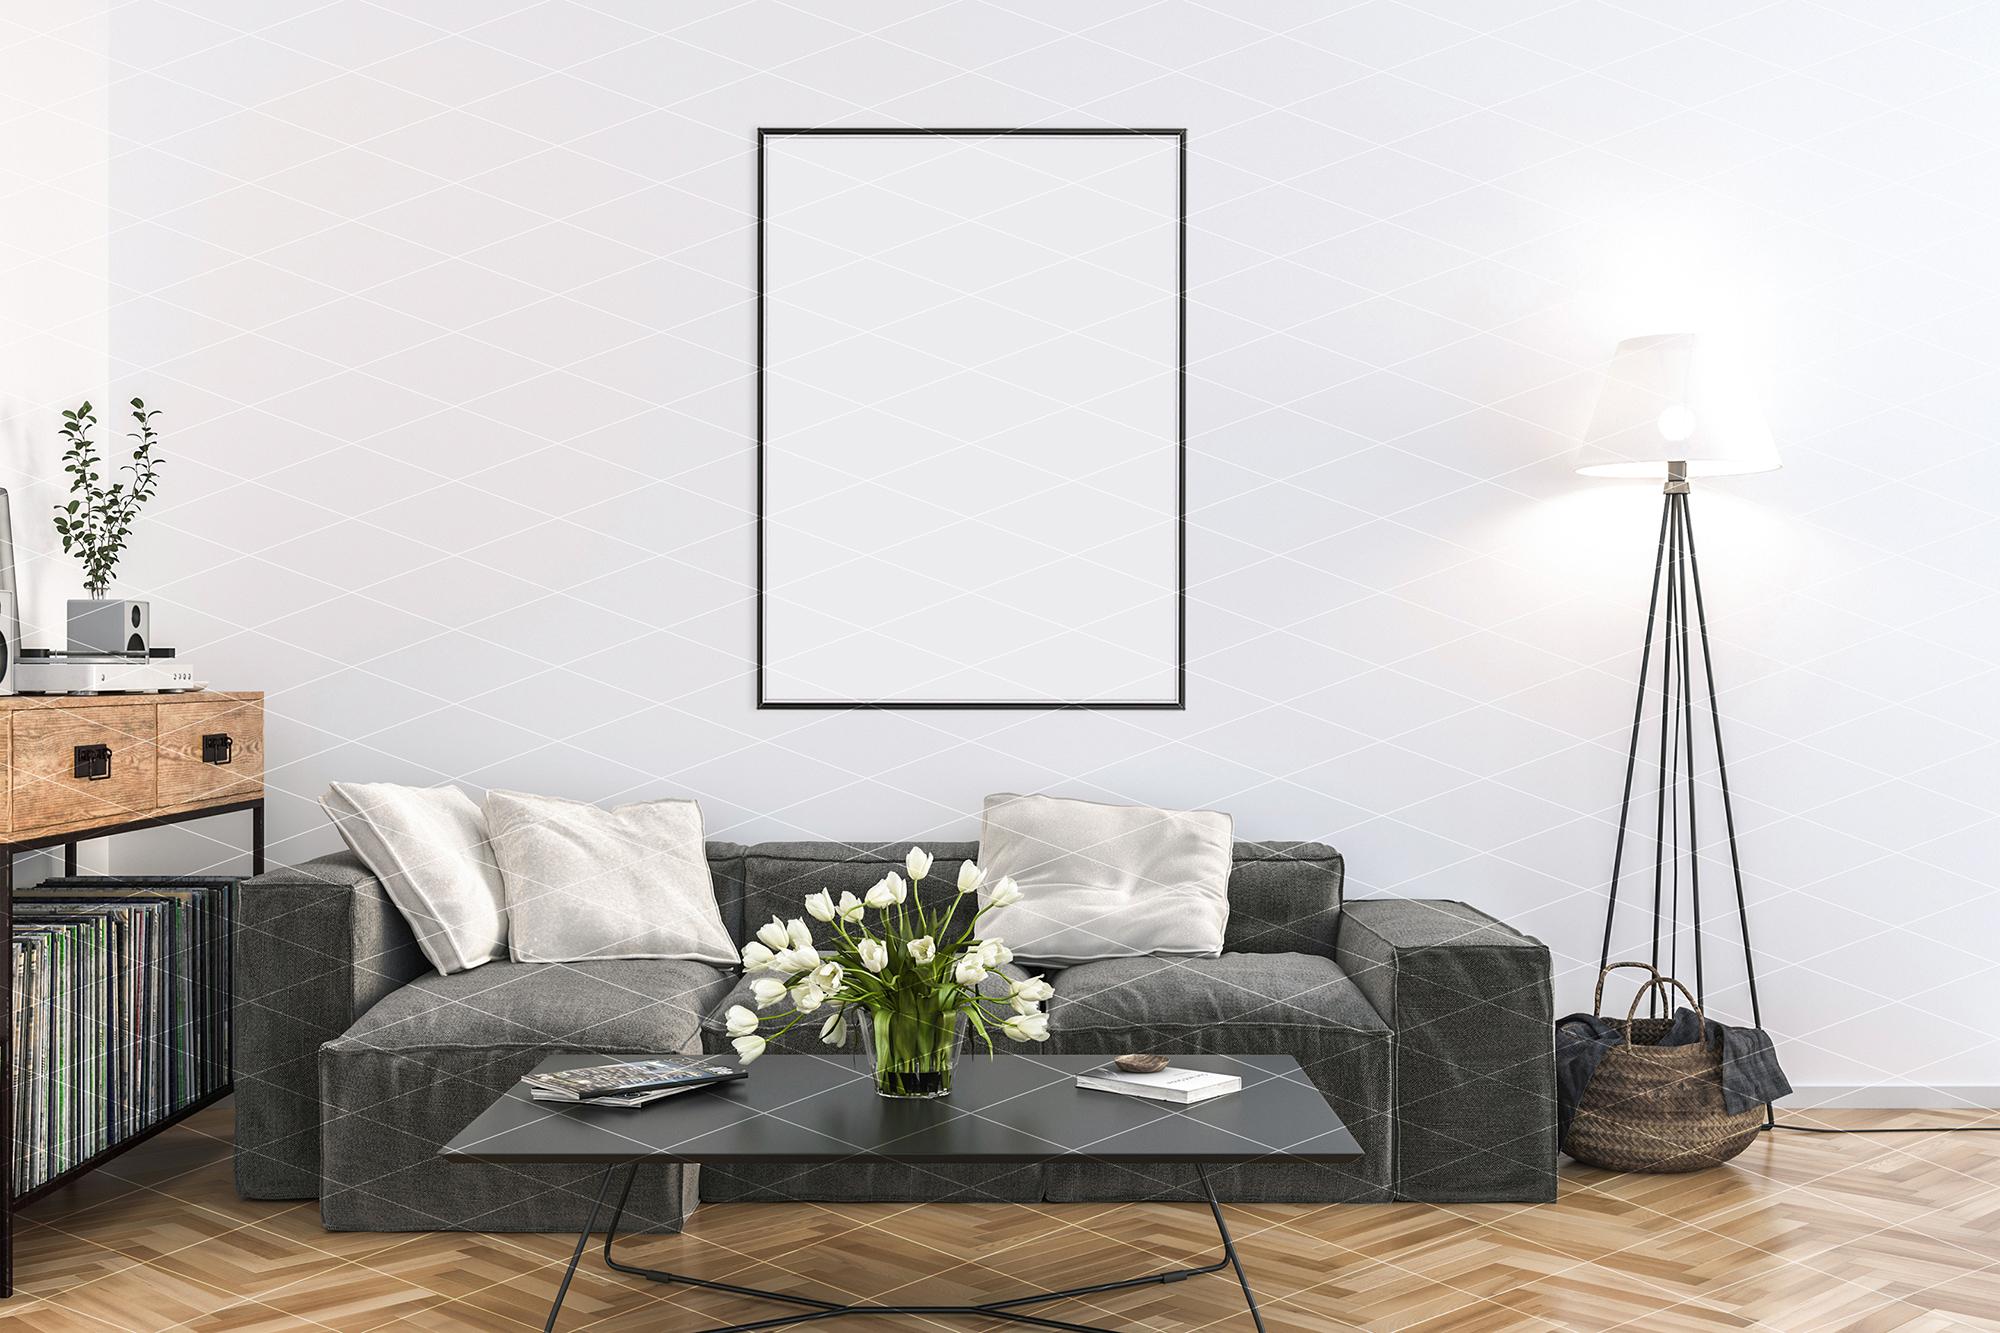 Interior mockup - artwork background - kitchen example image 4